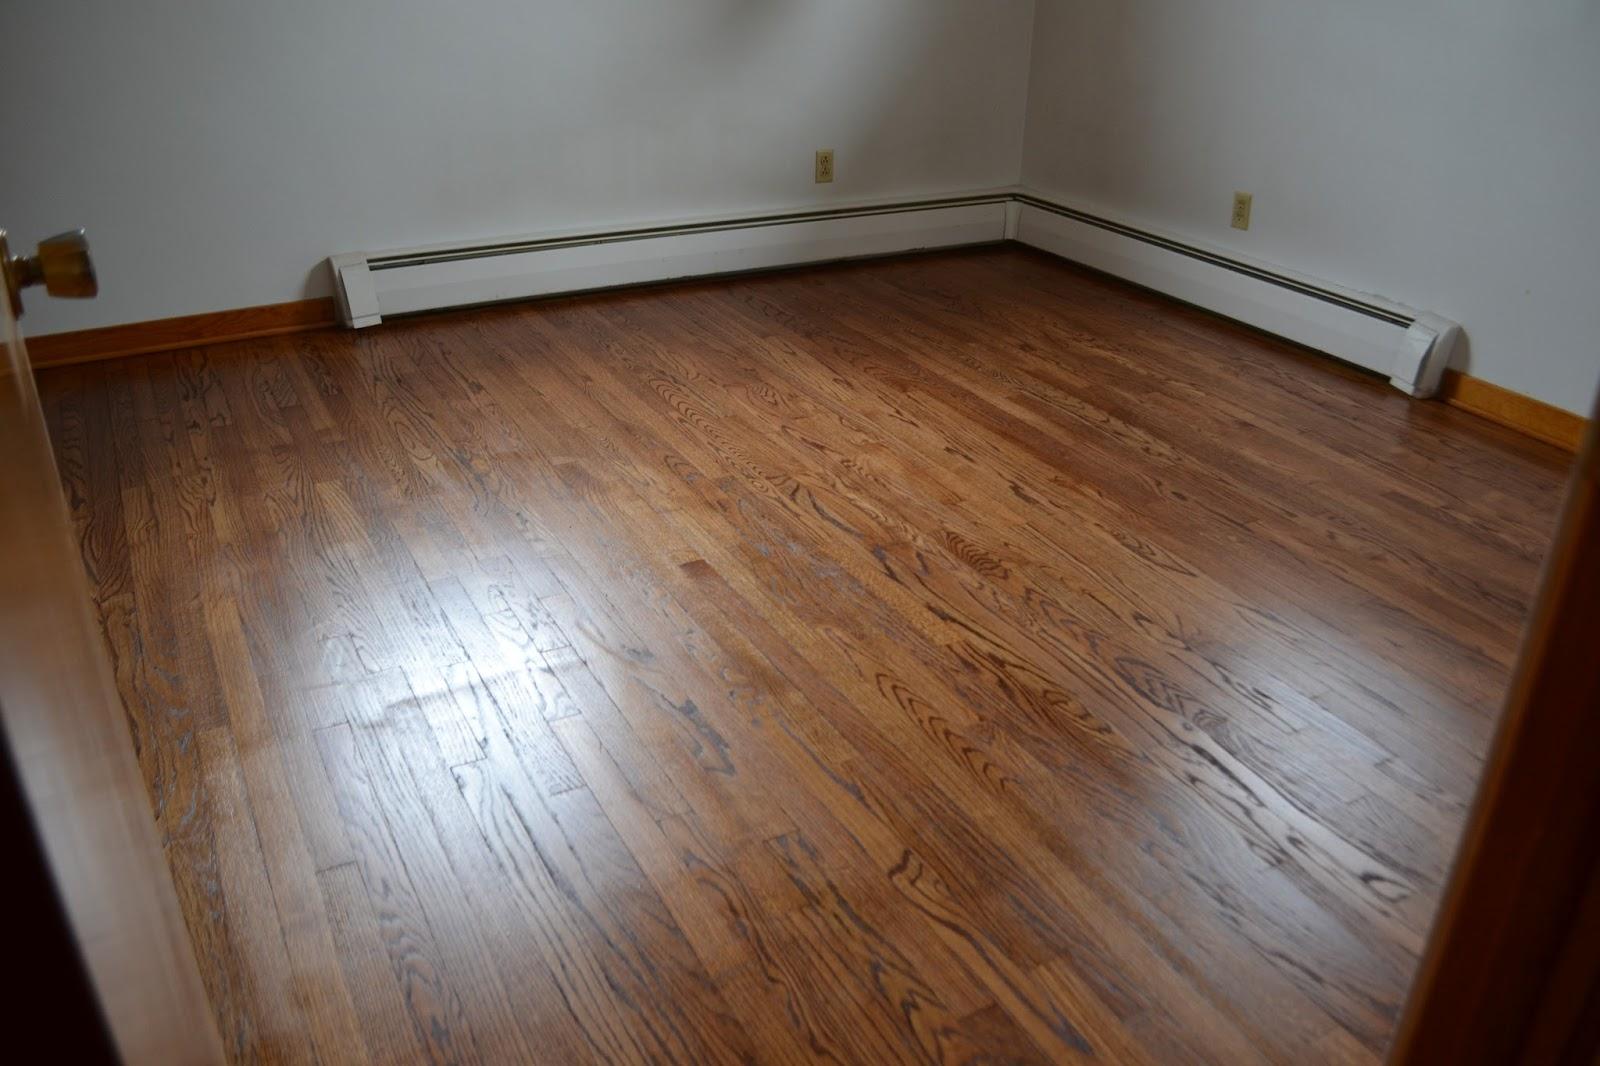 Pleasurable hobbies hardwood floors almost finished for Hardwood floors look dull